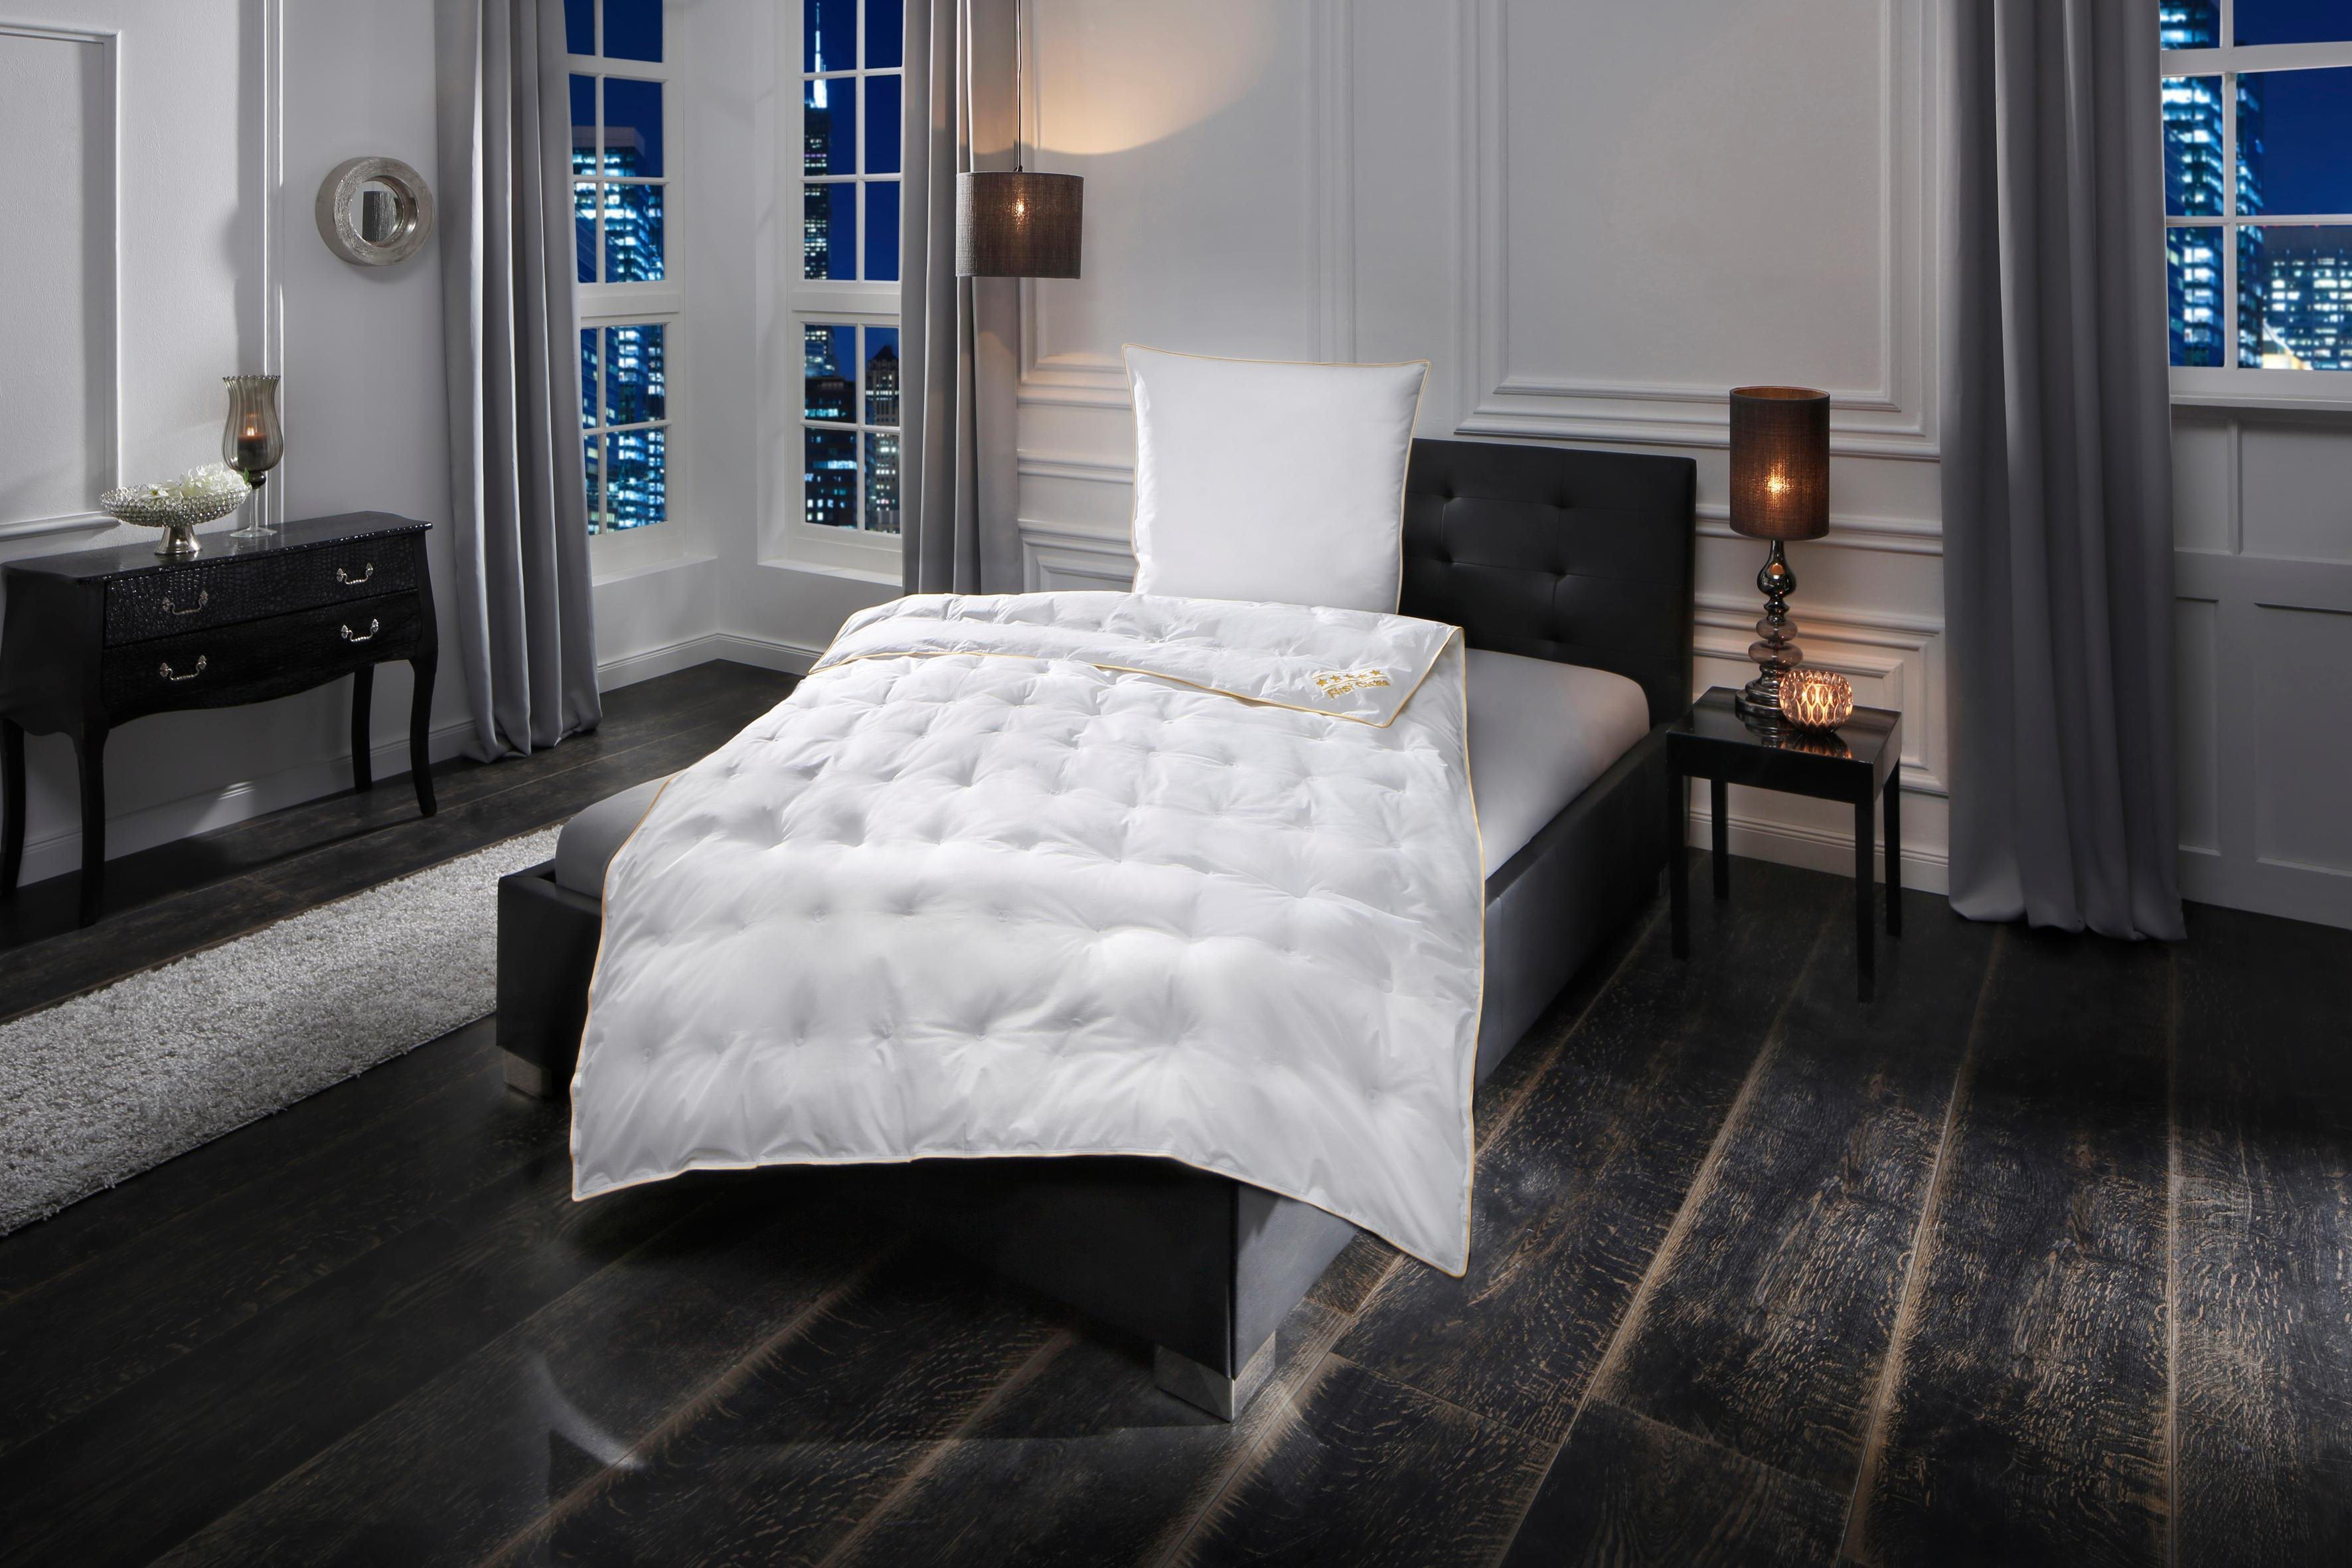 Daunenbettdecke, »Emilia«, OBB, leicht, Füllung: 90% Daunen, 10%Federn, (1-tlg) | Heimtextilien > Decken und Kissen > Bettdecken | OBB